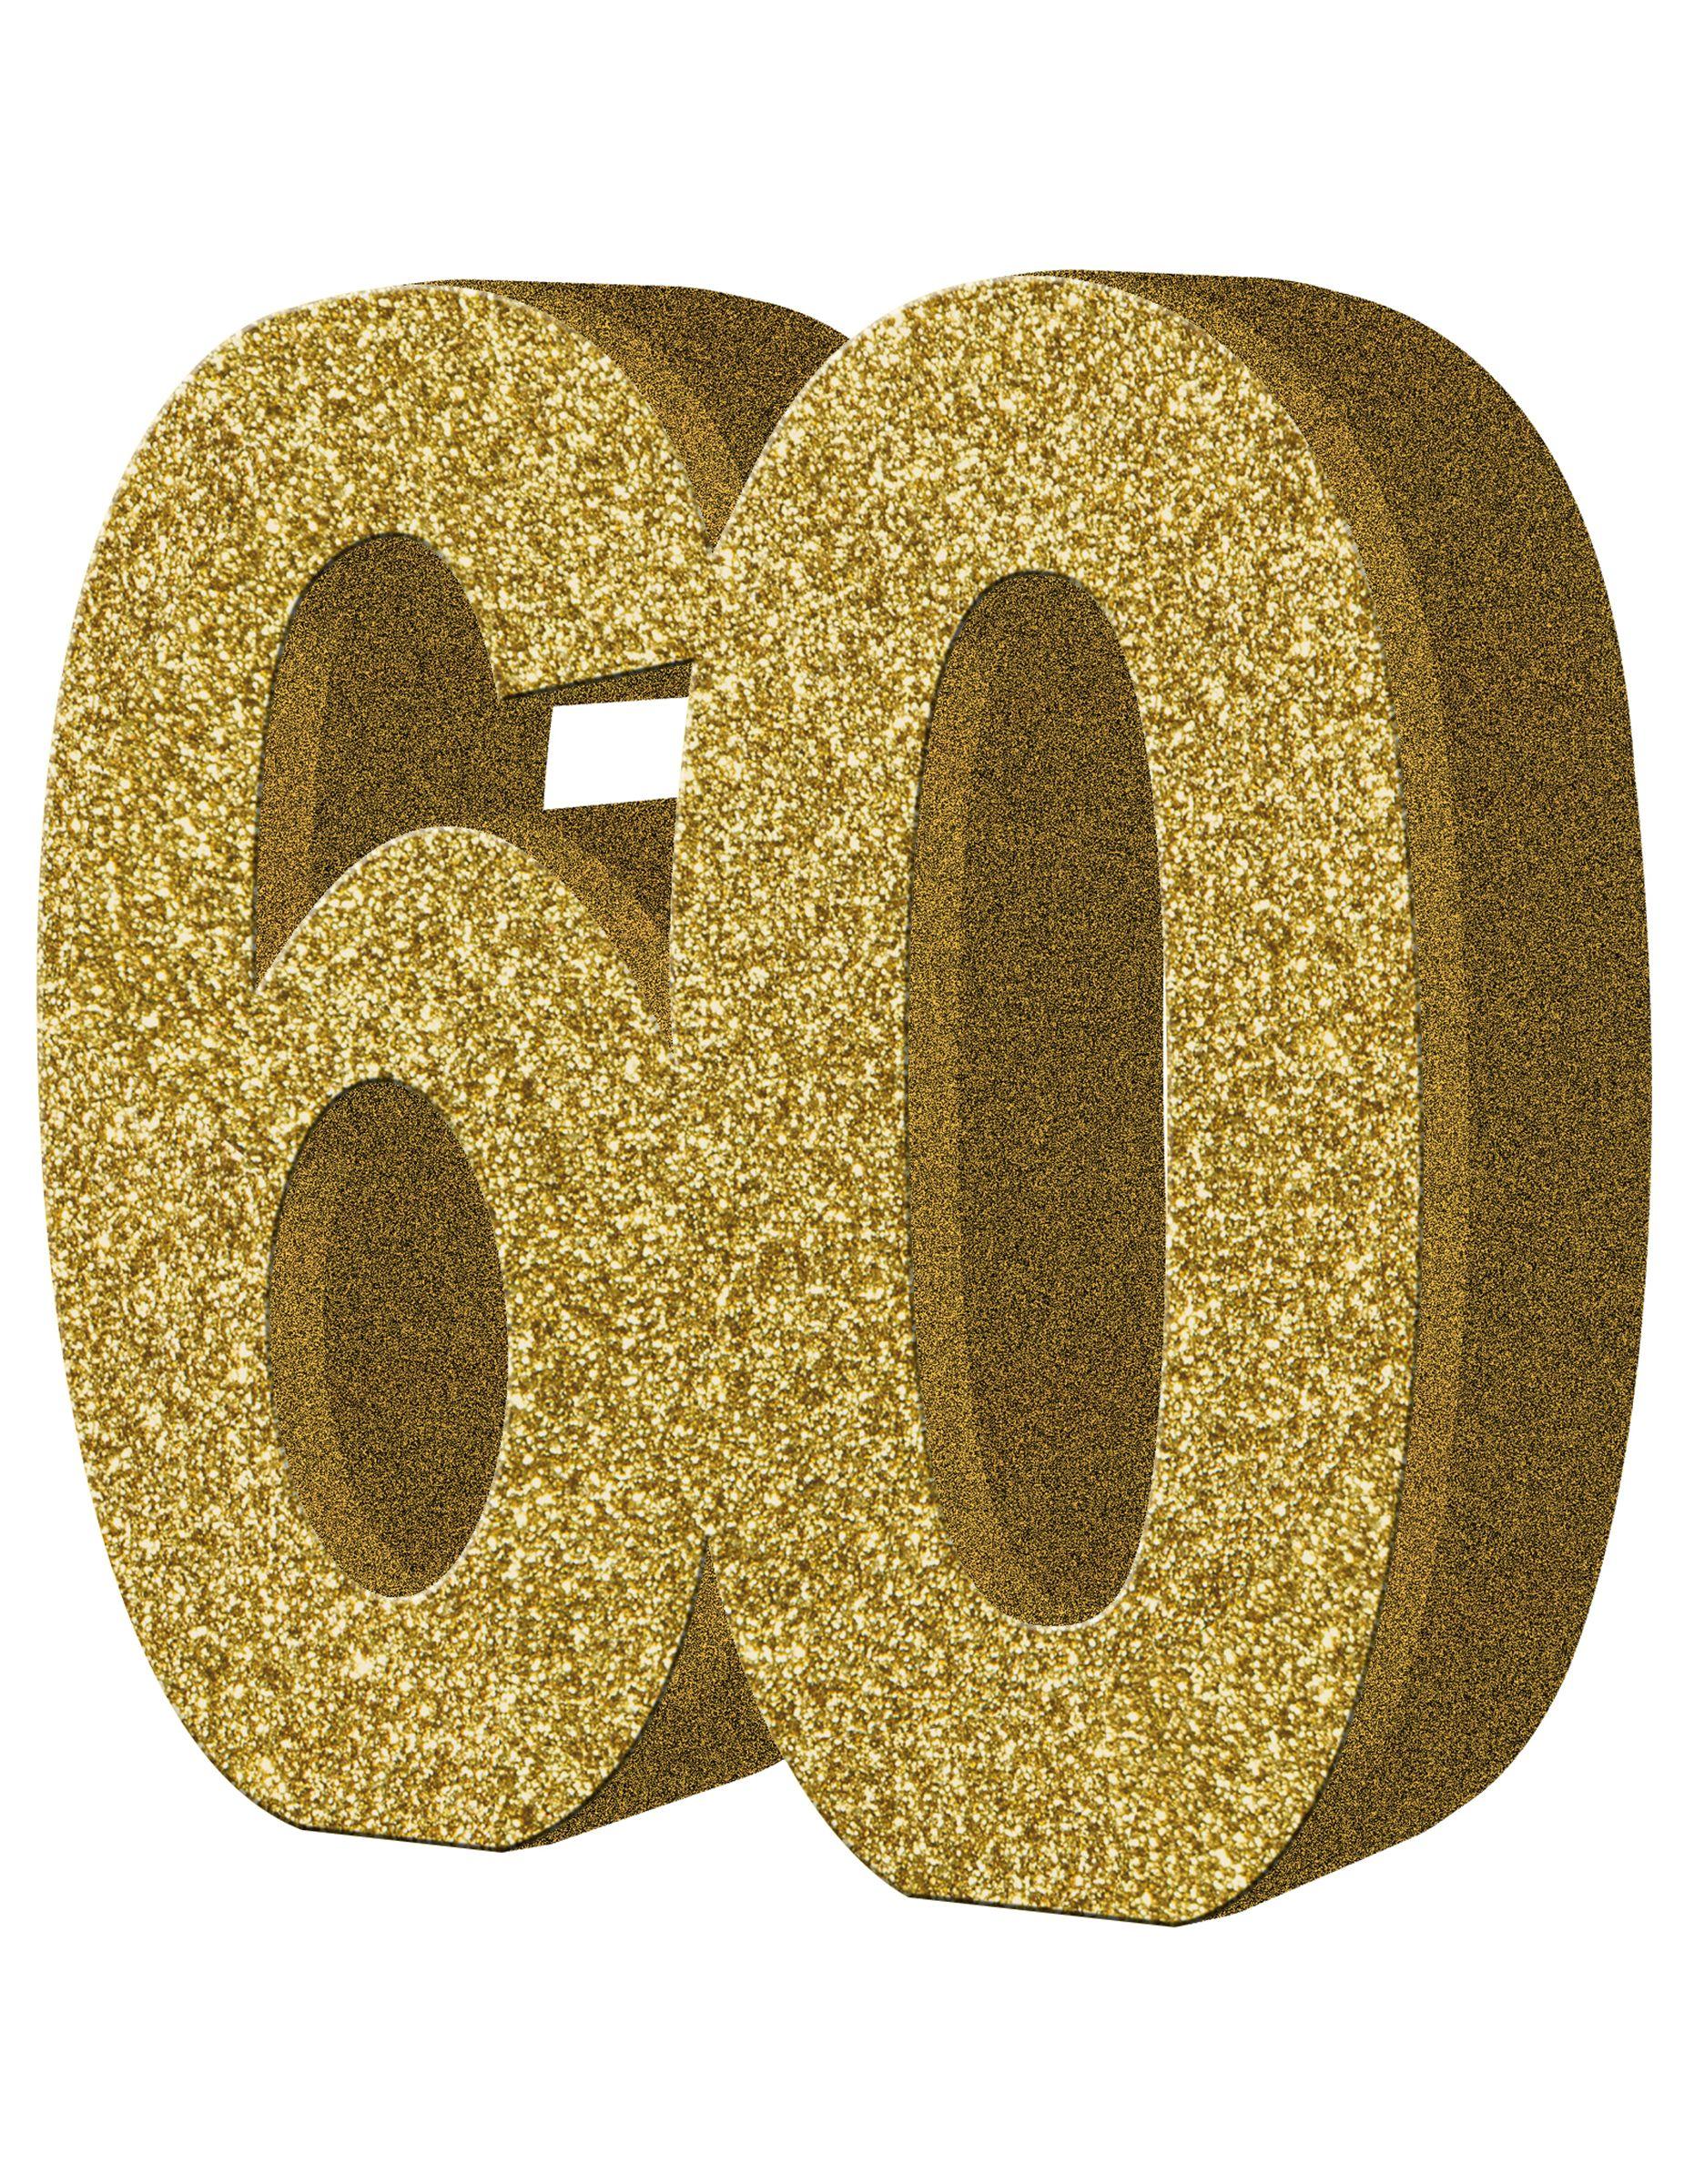 Decoraci n de mesa 60 a os este centro de mesa el n mero for Decoracion 60 30 10